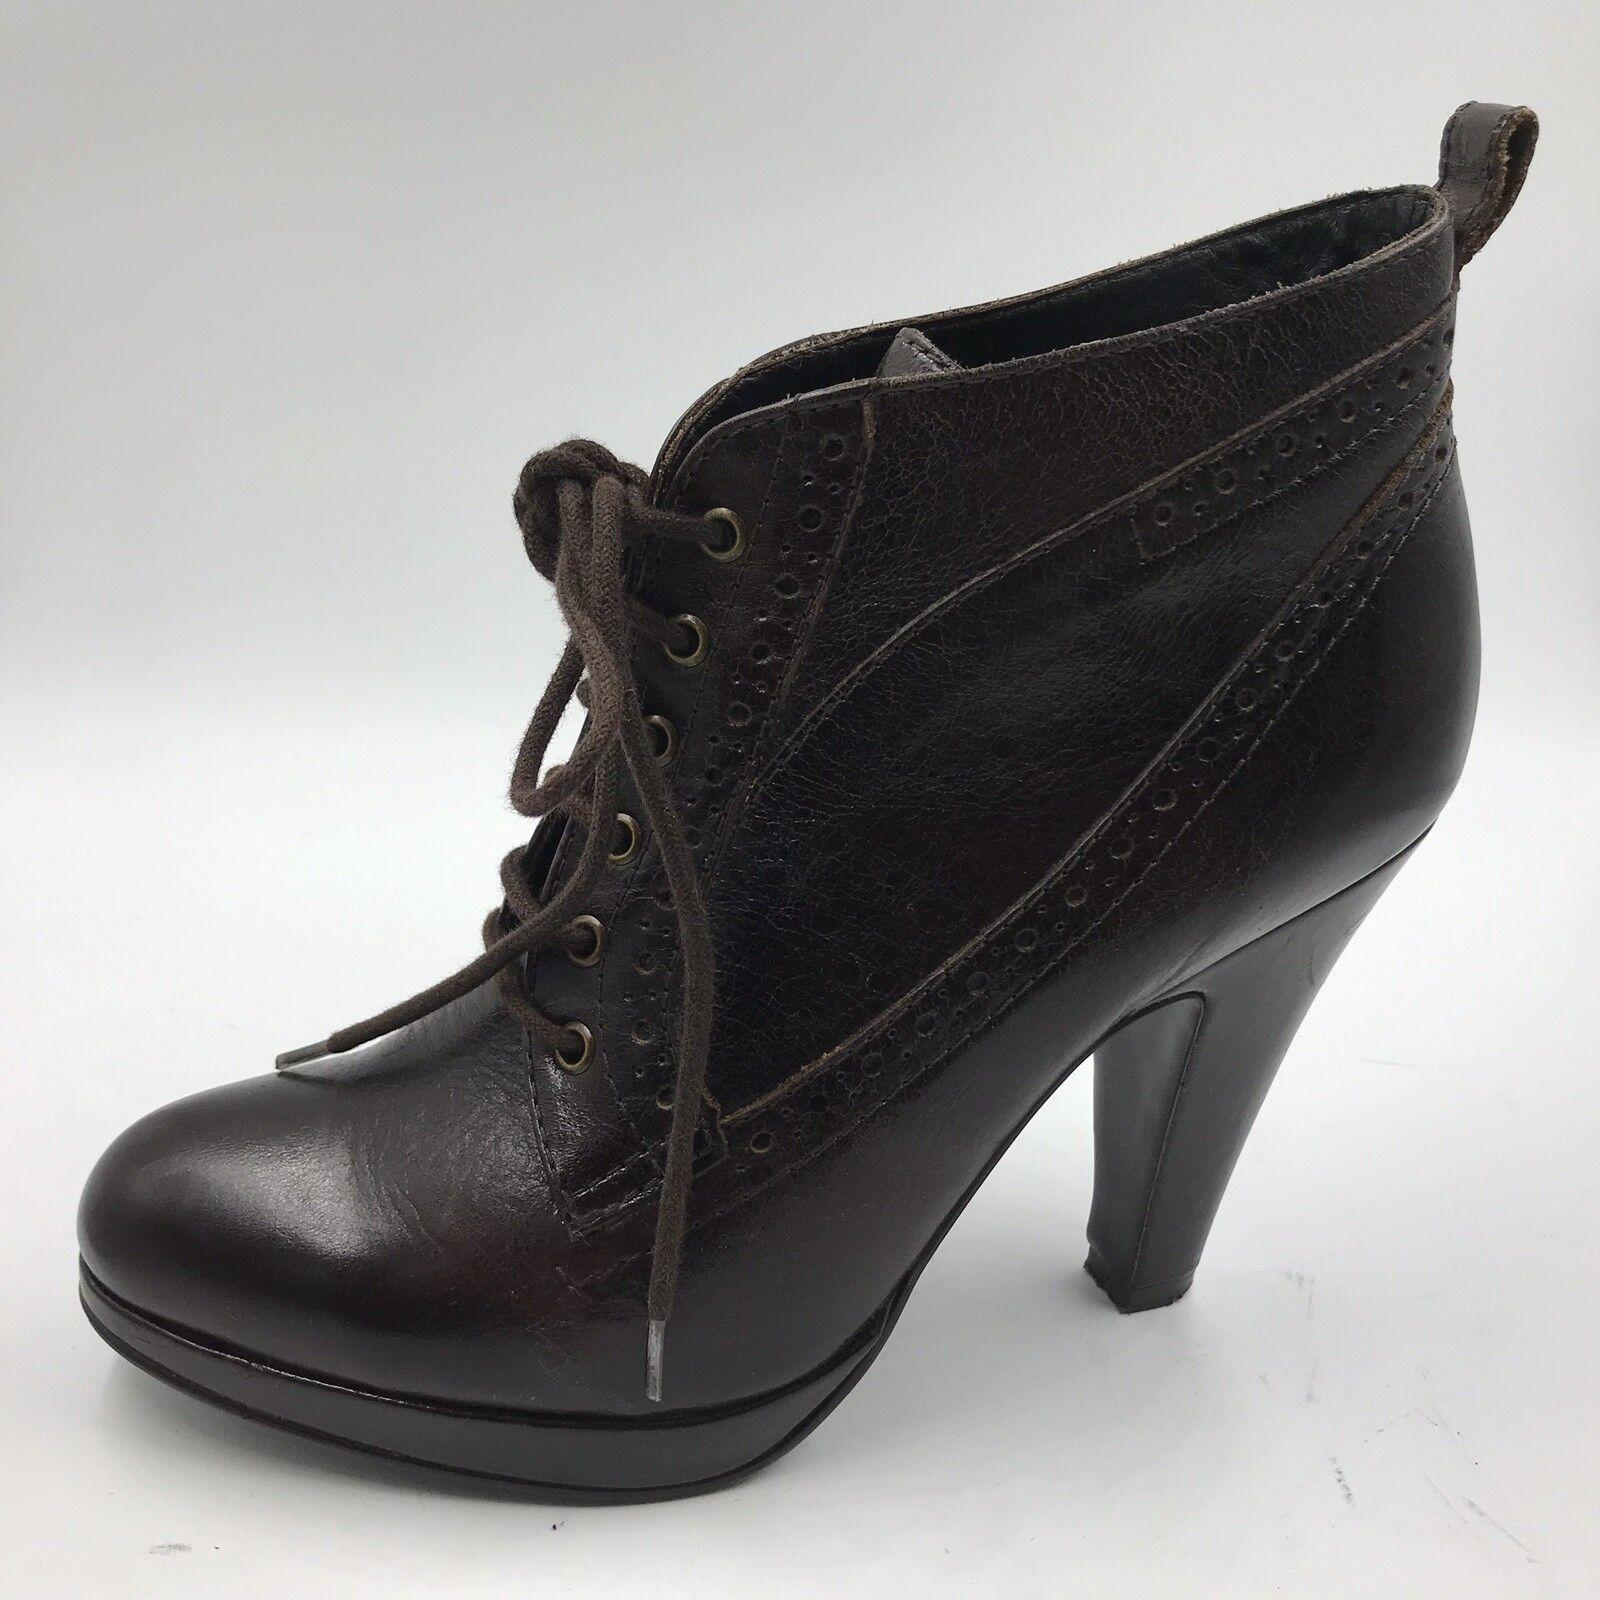 Kurt Geiger KG Sz 39 6 Brown Leather shoes Boots Victorian Steampunk Goth Womens